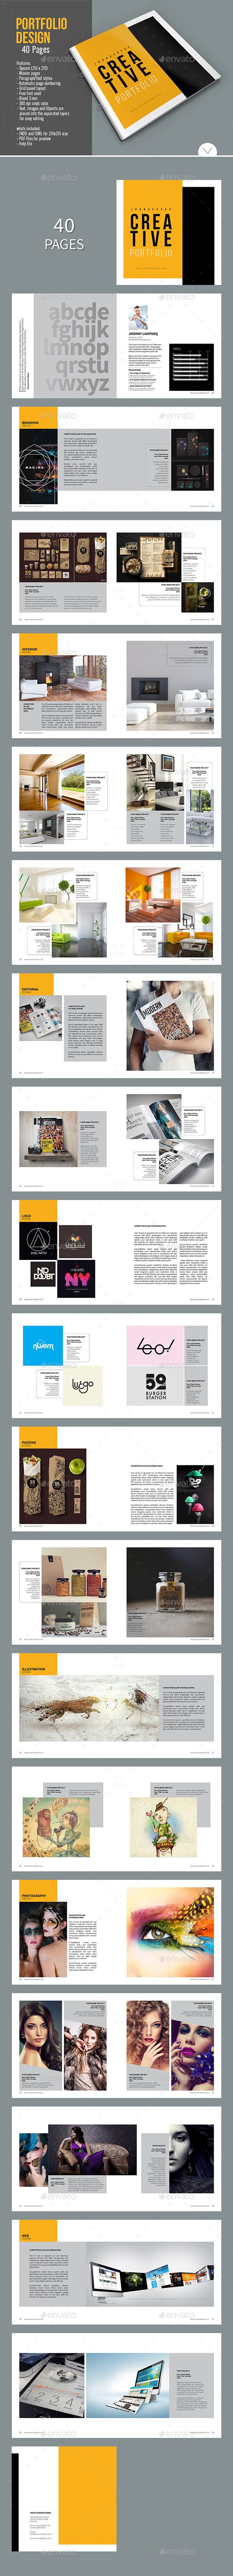 Graphic Design Portfolio Template | Portafolio, Editorial y Diseño ...